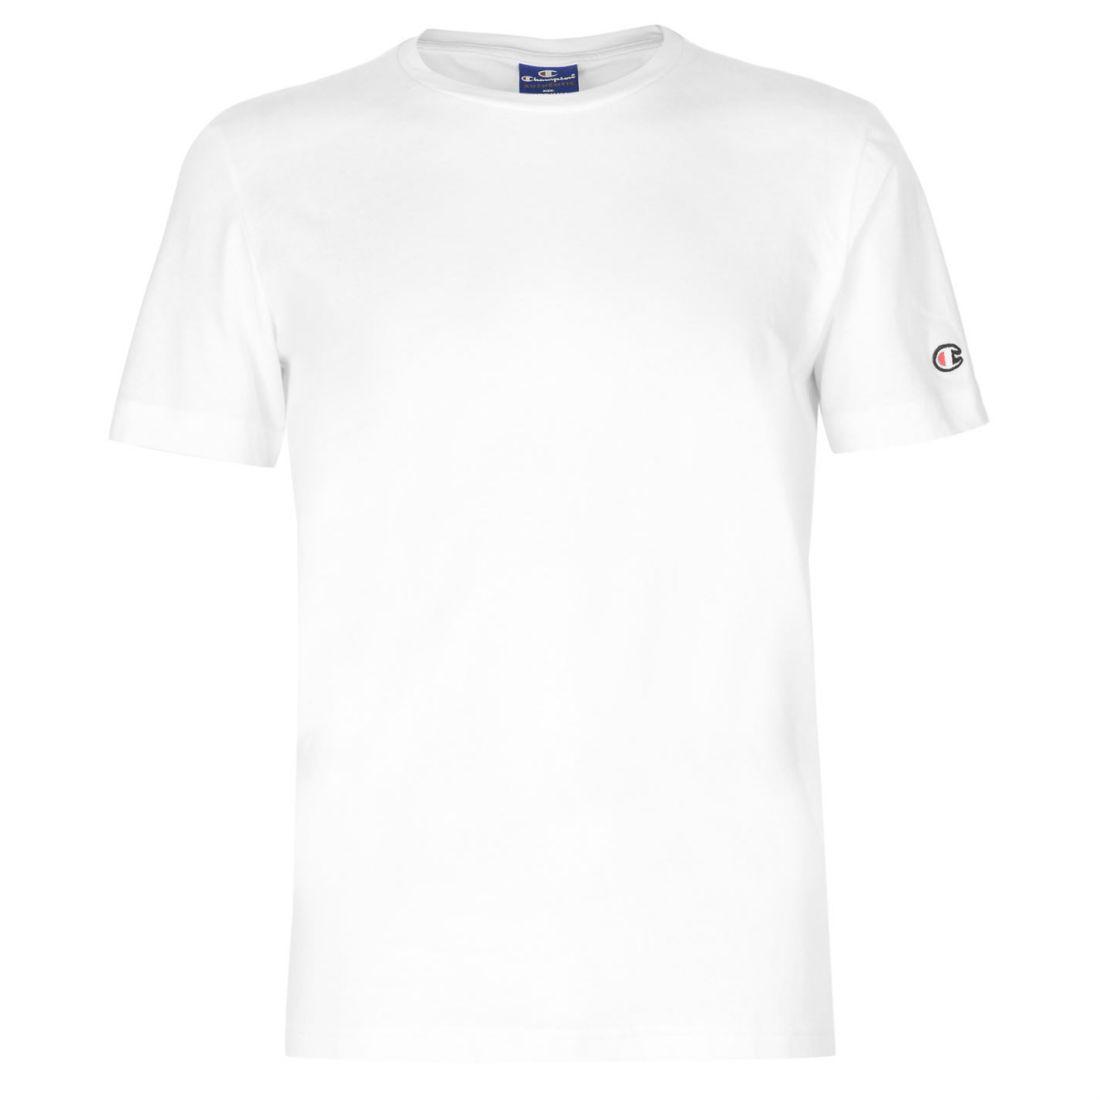 001316c6 Details about Mens Champion Basic T Shirt Crew Neck Short Sleeve New